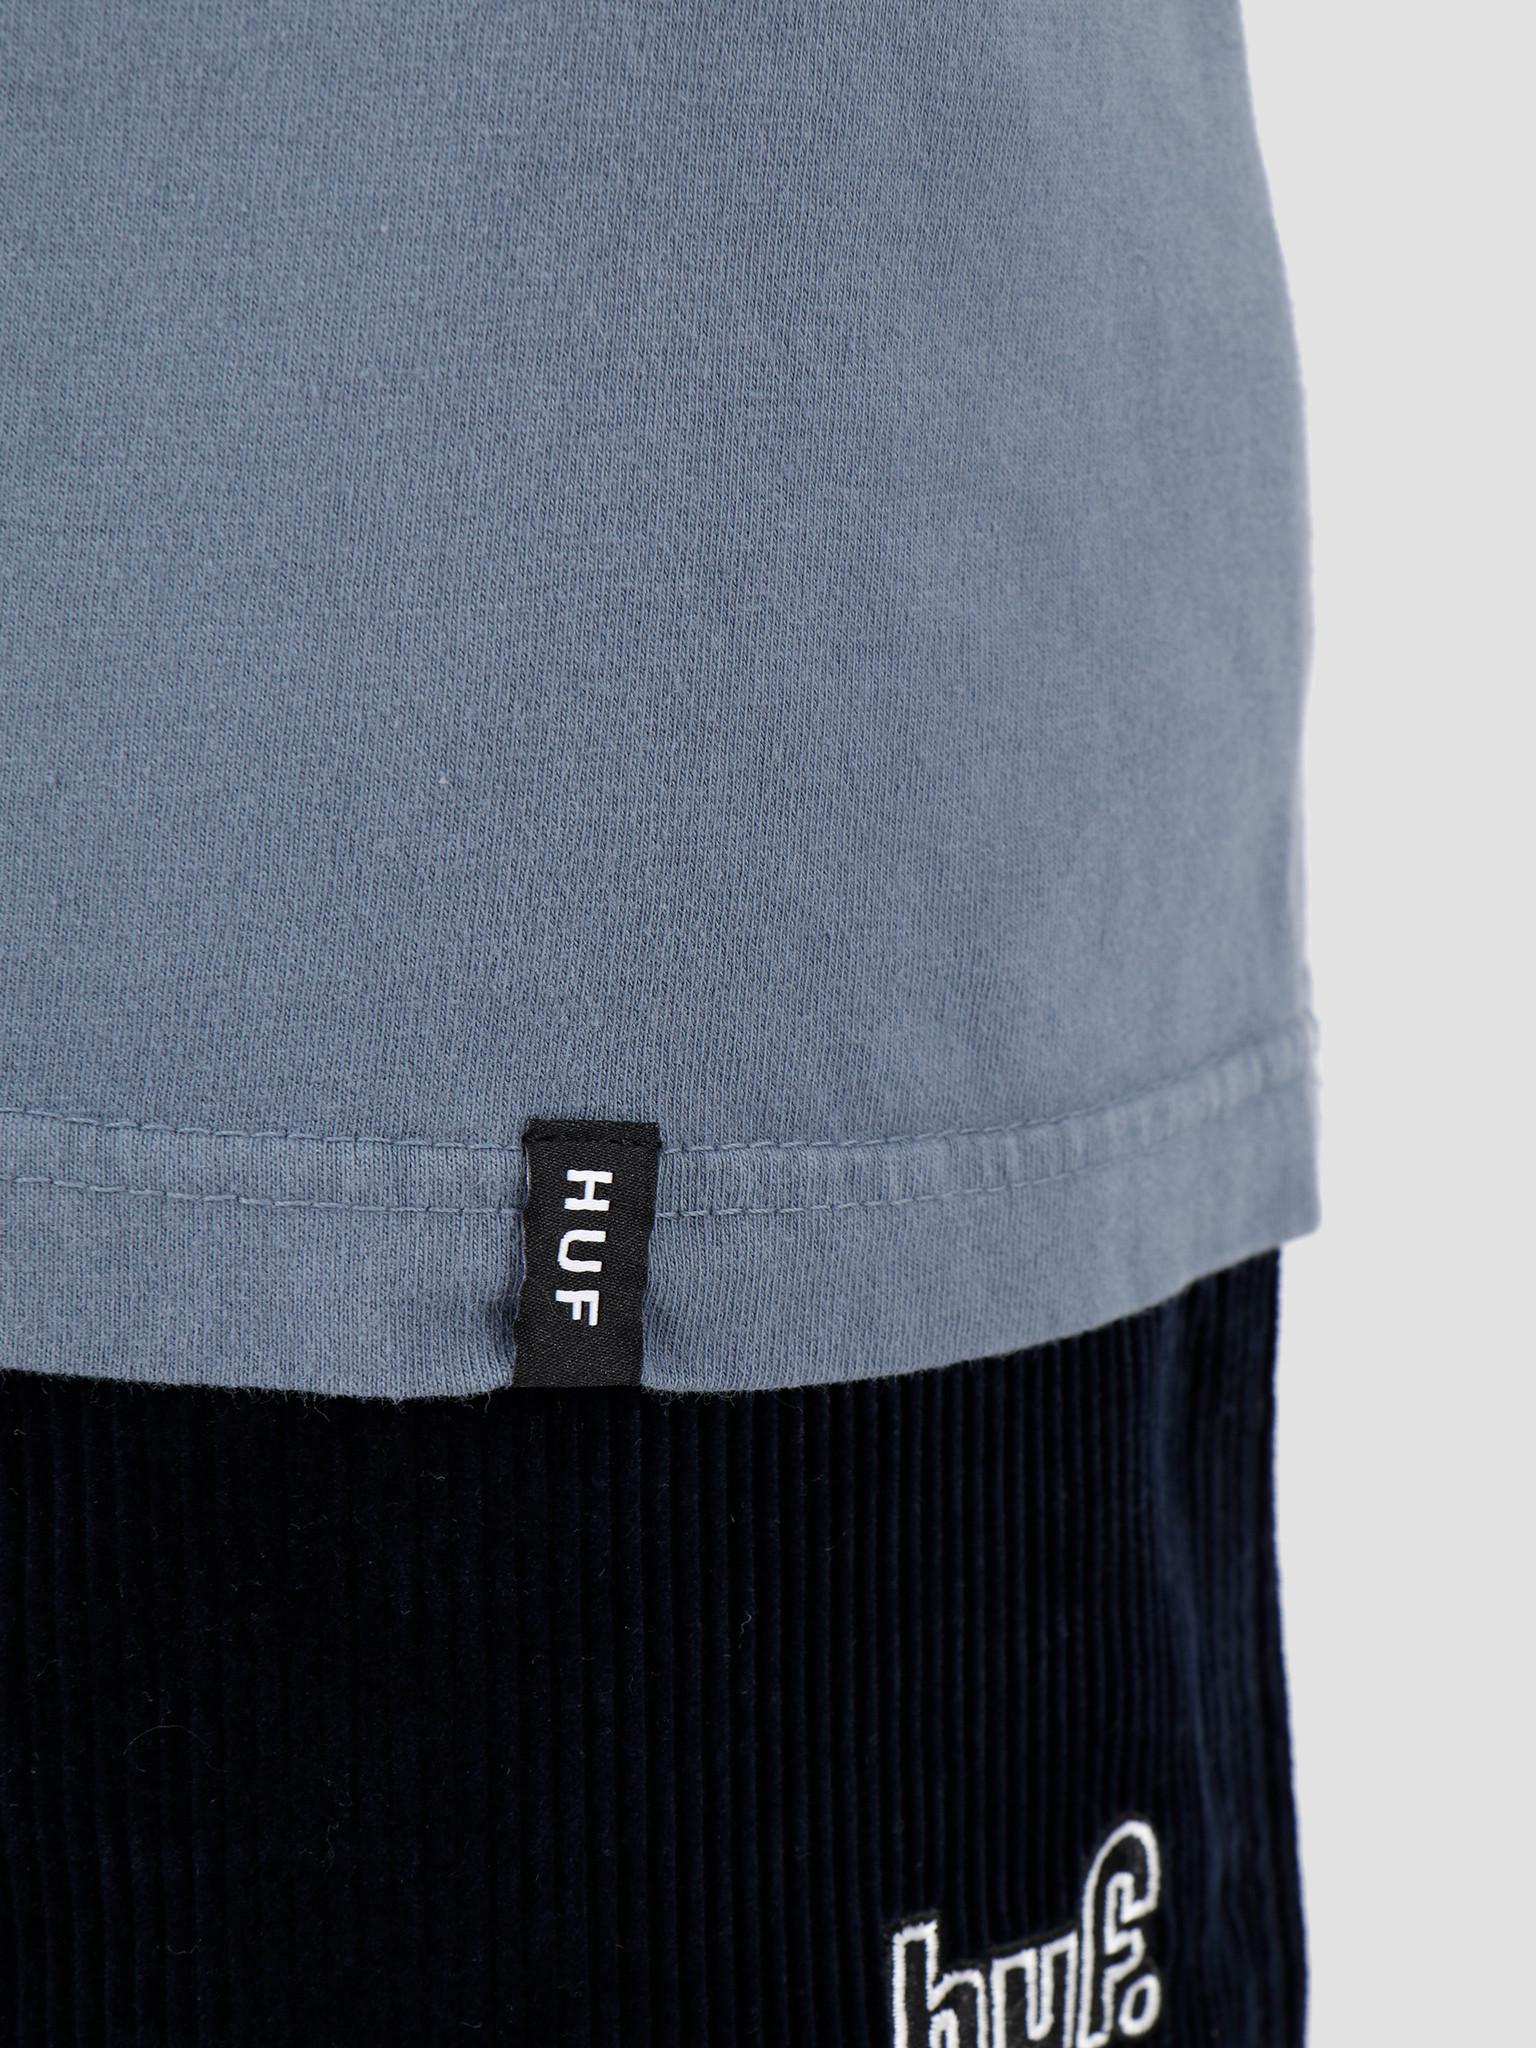 HUF HUF Action Hero Longsleeve T-Shirt Blue Mirage TS00809-BLMIR